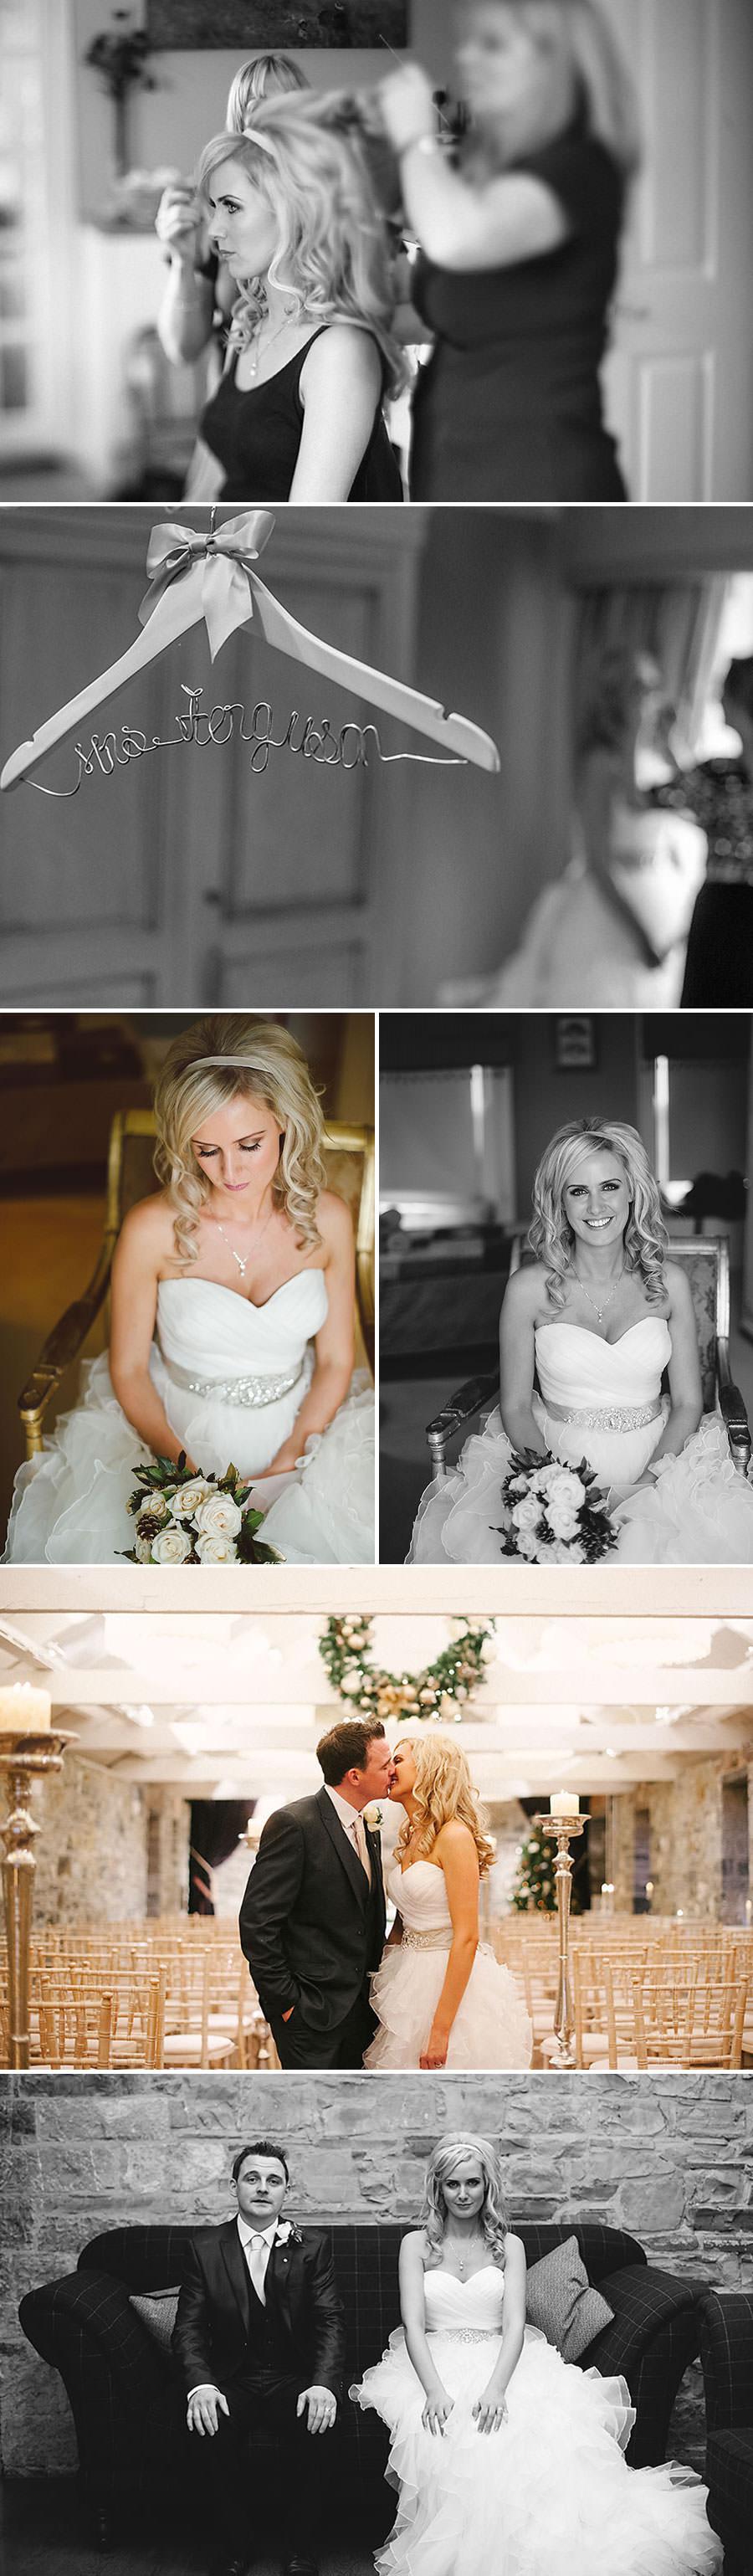 A + D | Ballymagarvey Village Humanist Wedding | Preview | Irish Wedding Photography | 1